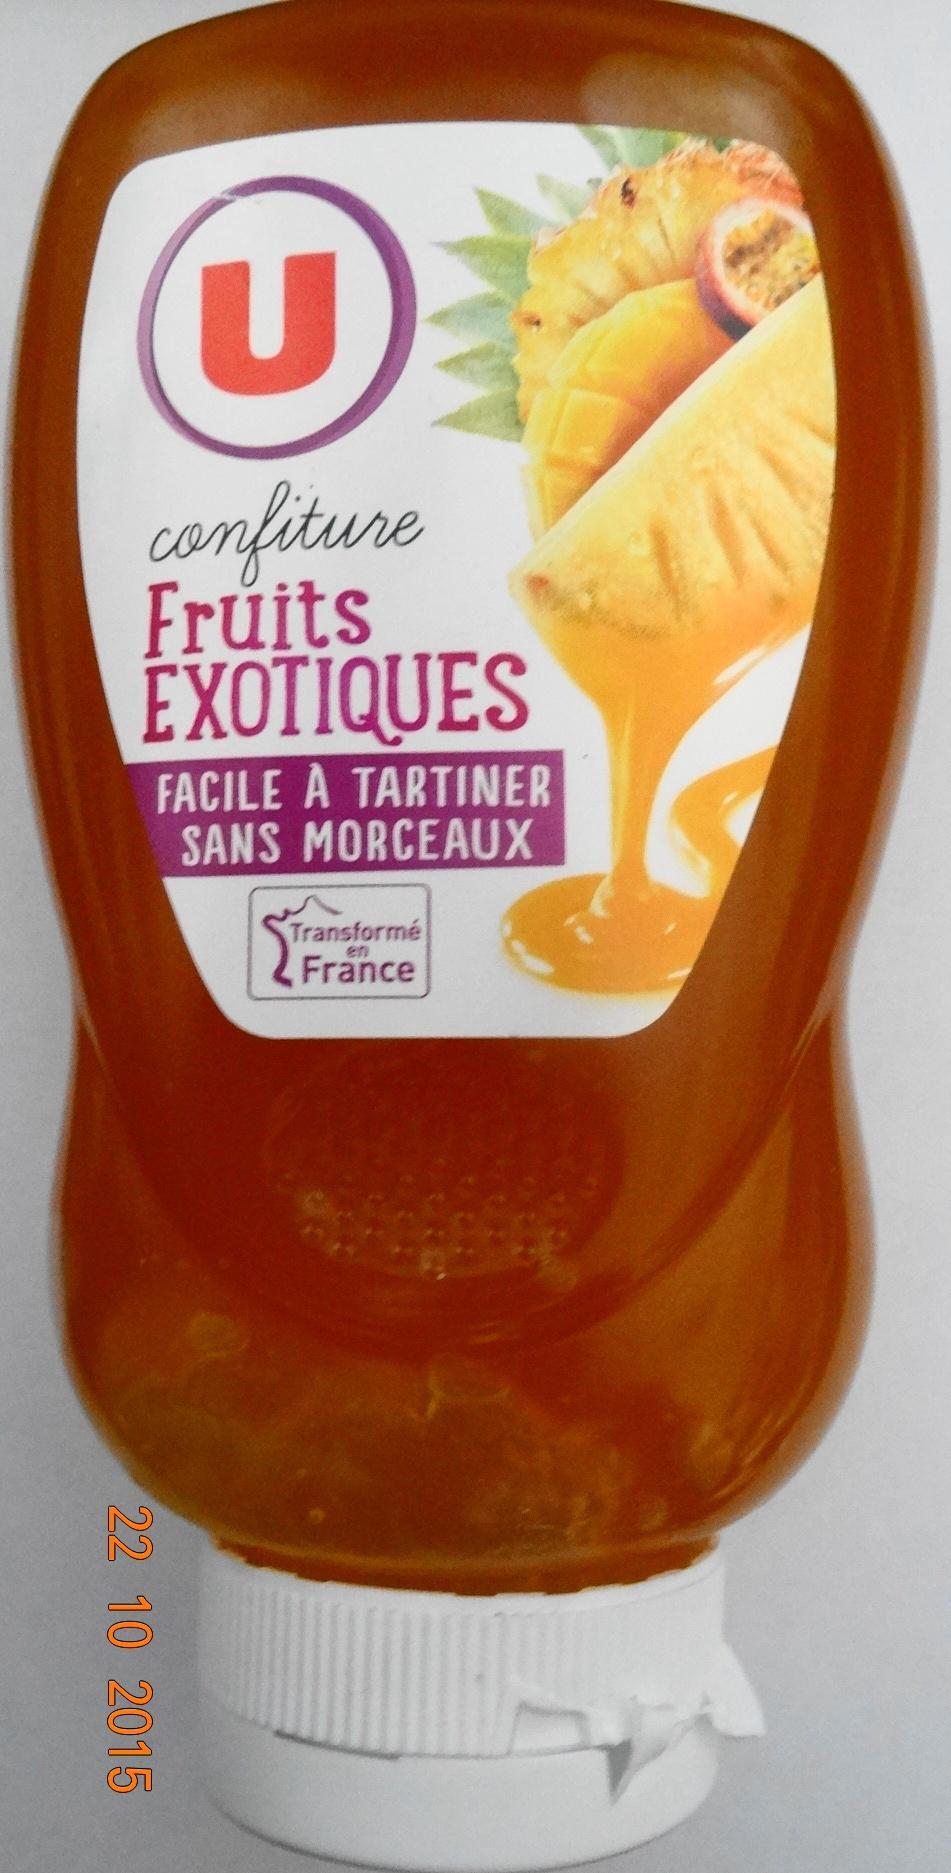 Confiture Fruits Exotiques - Product